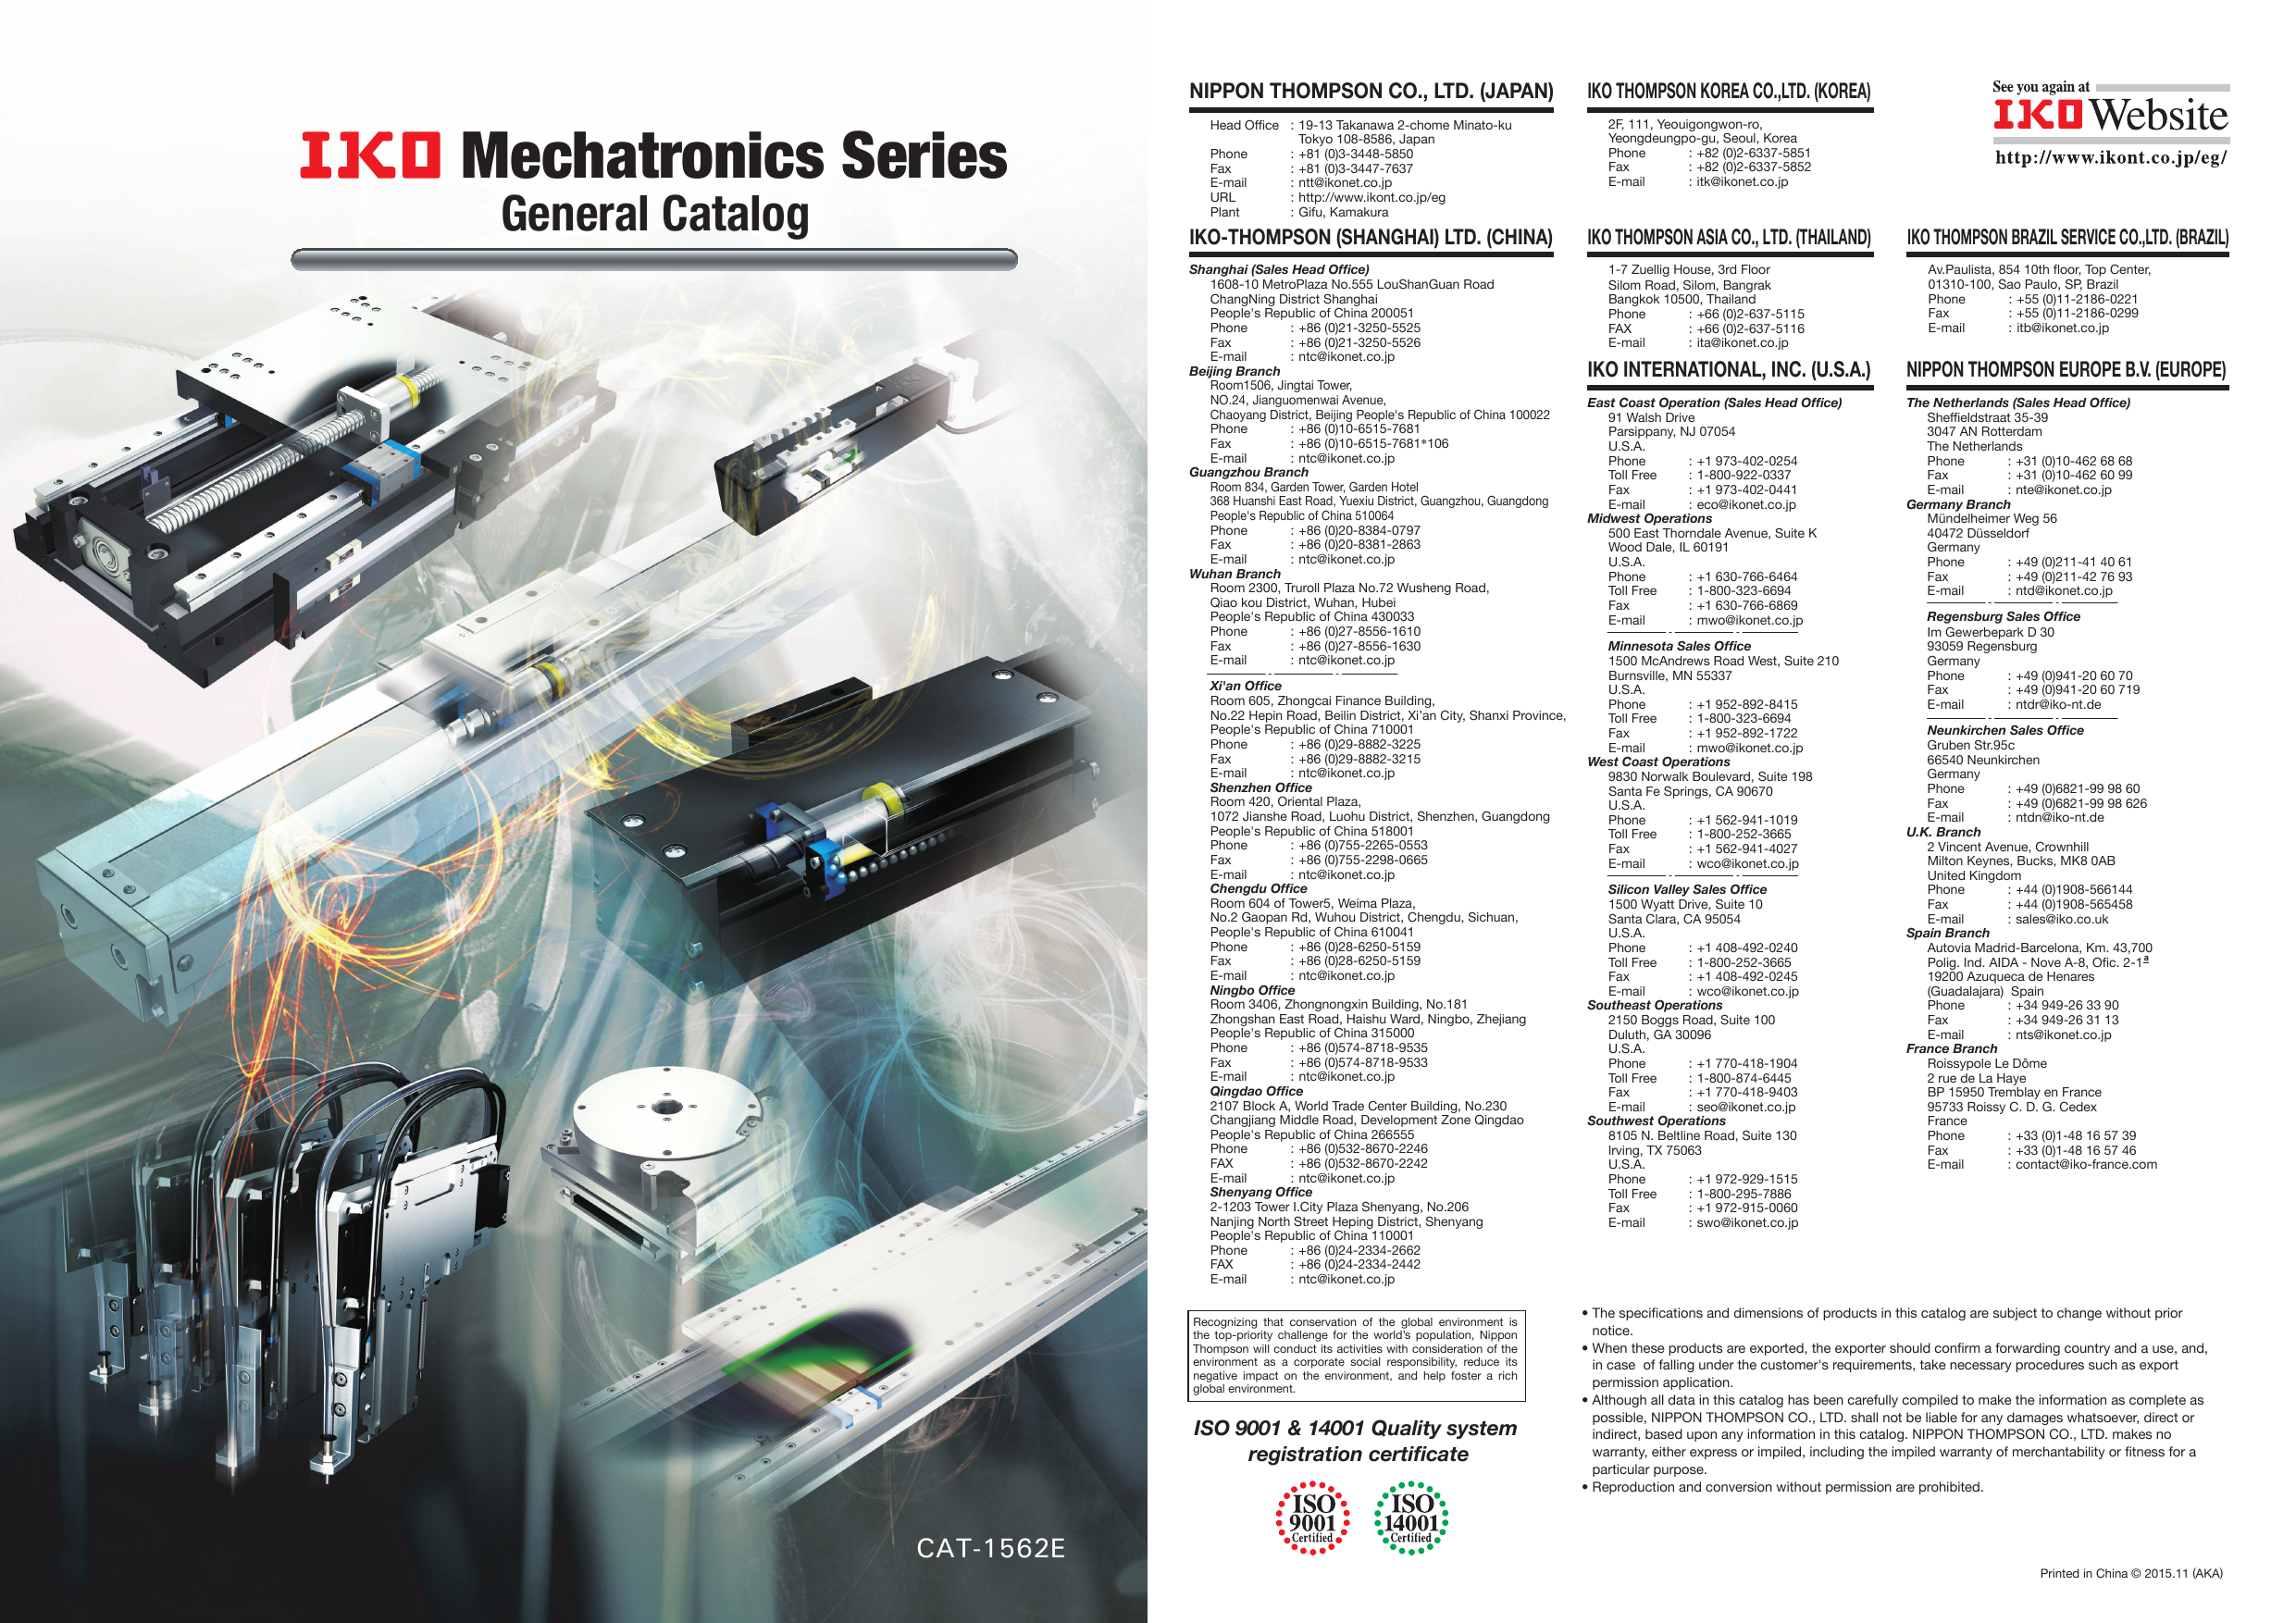 IKO Mechatronics Series General Catalog